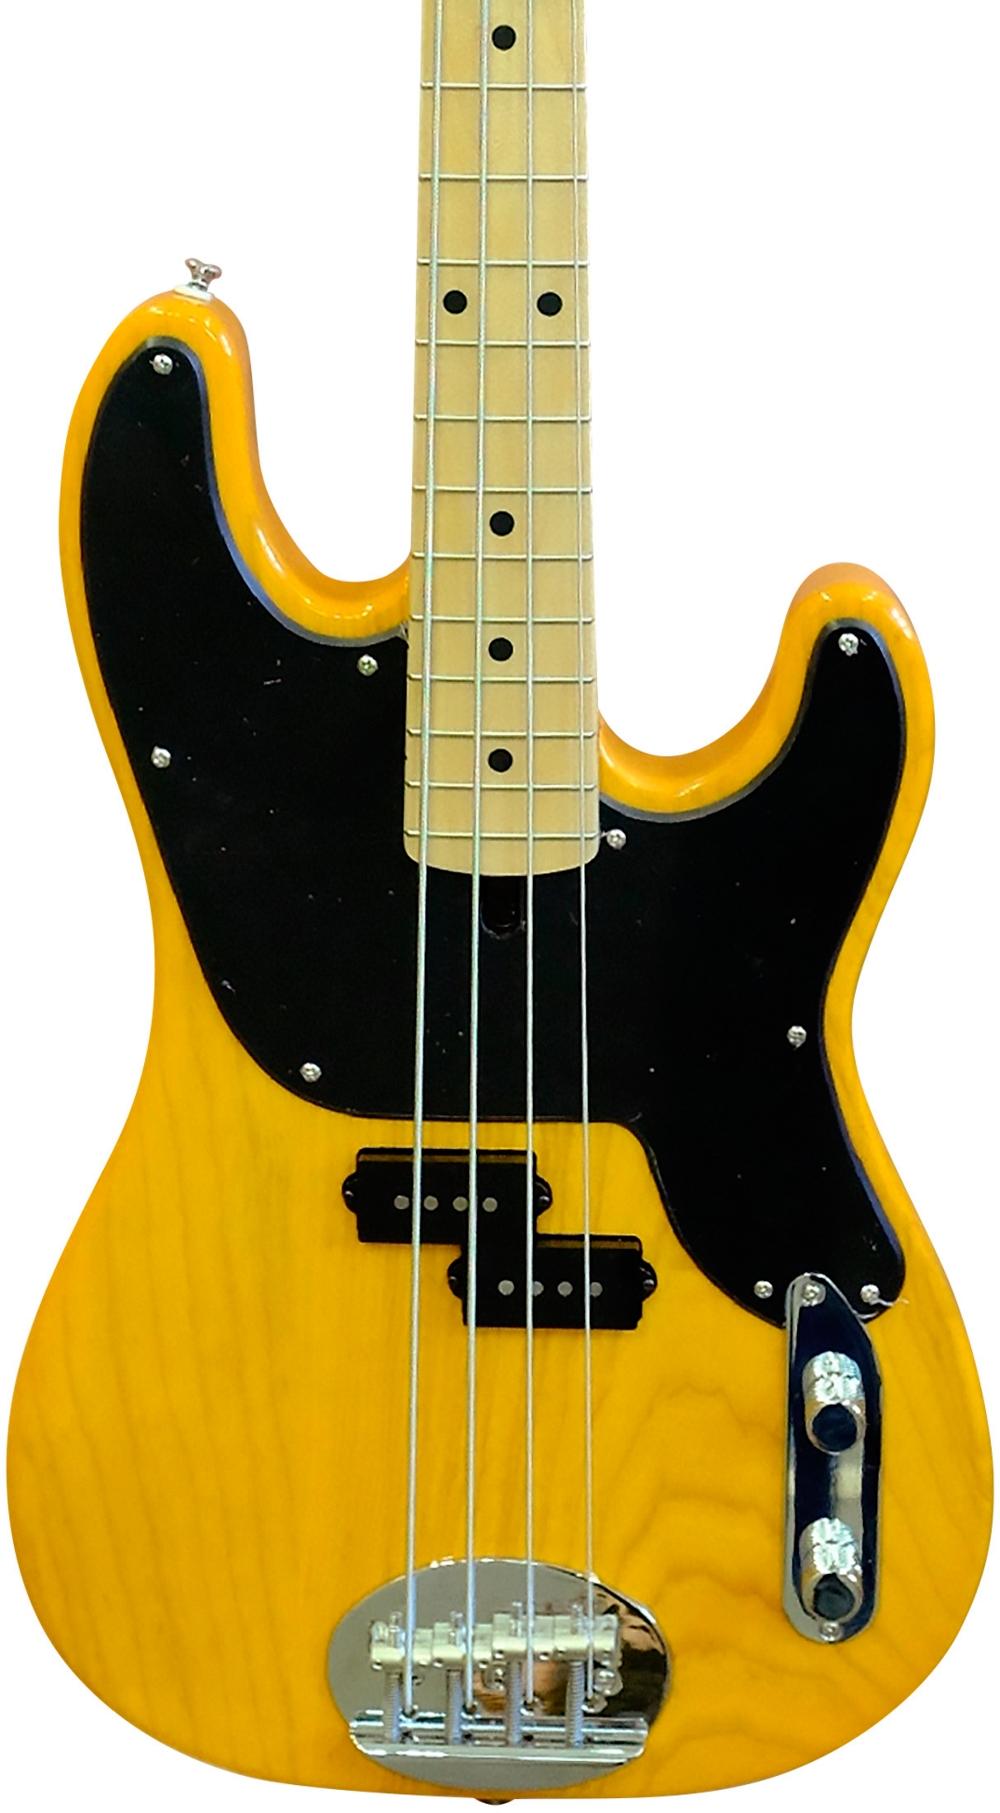 Lackland Bass Guitars : lakland skyline 44 51 maple fretboard 4 string electric bass guitar blonde 810401010832 ebay ~ Russianpoet.info Haus und Dekorationen